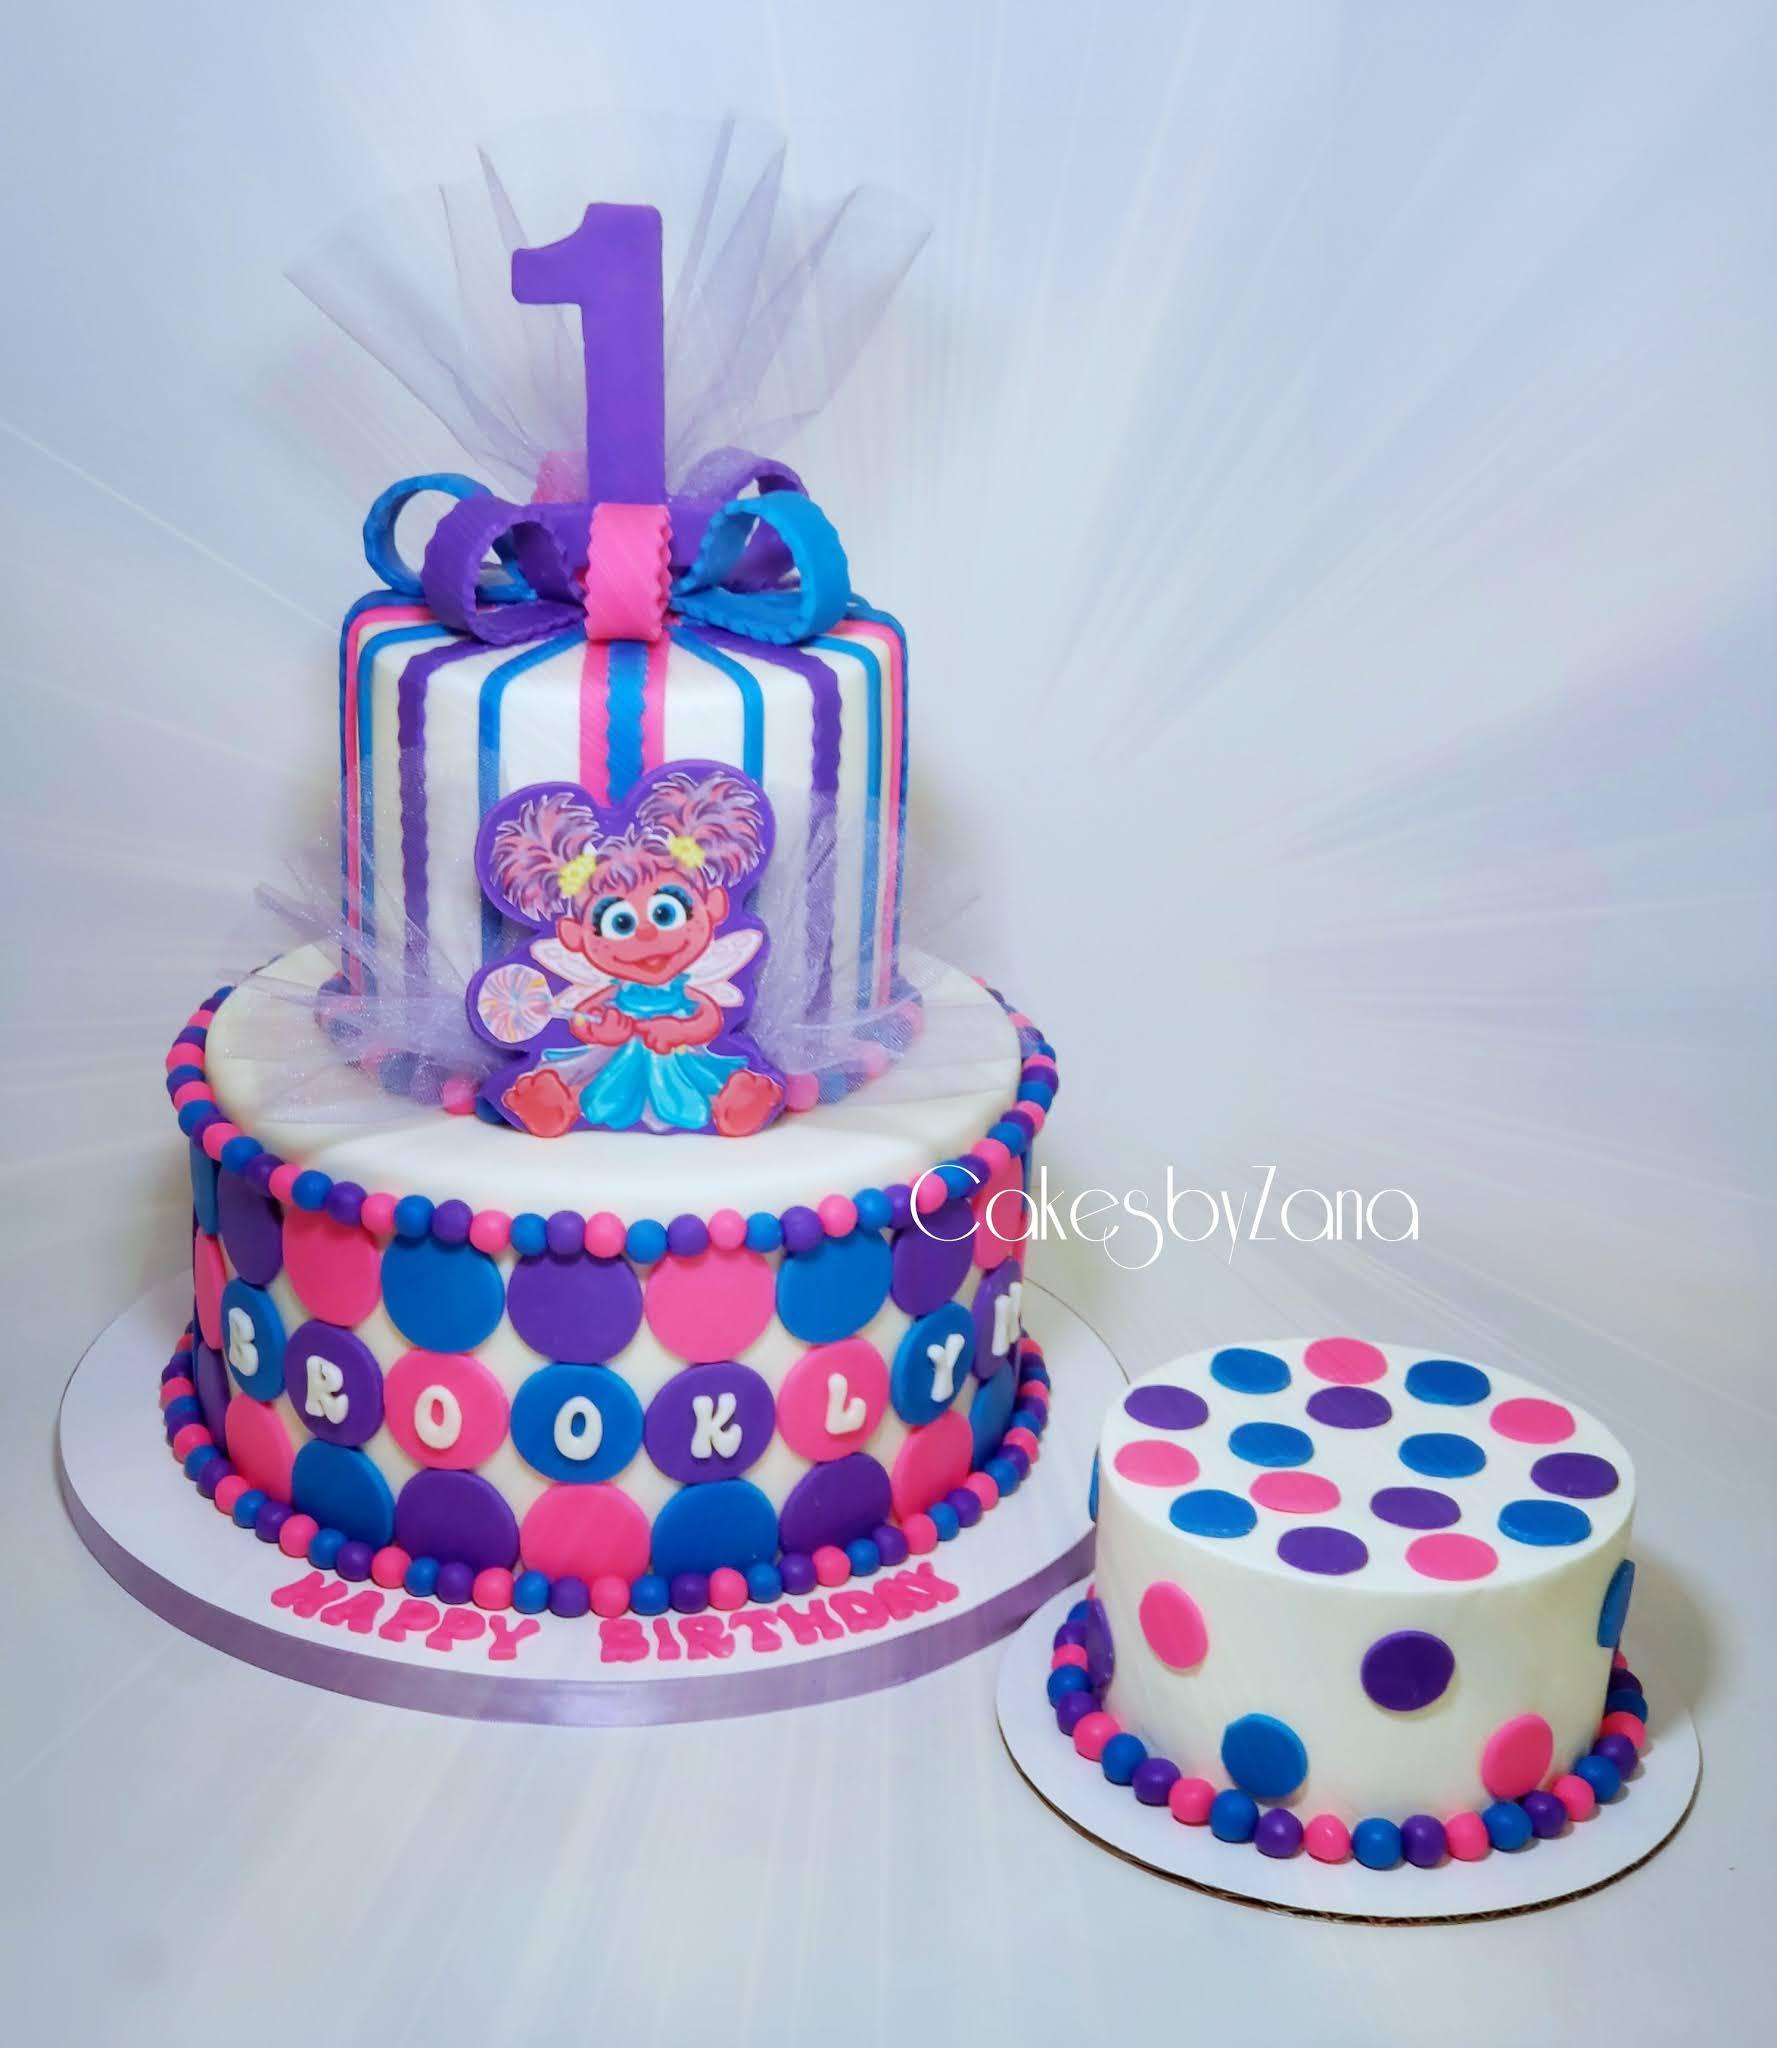 Cakesbyzana Abby Cadabby 1st Birthday Cake Smash Cake